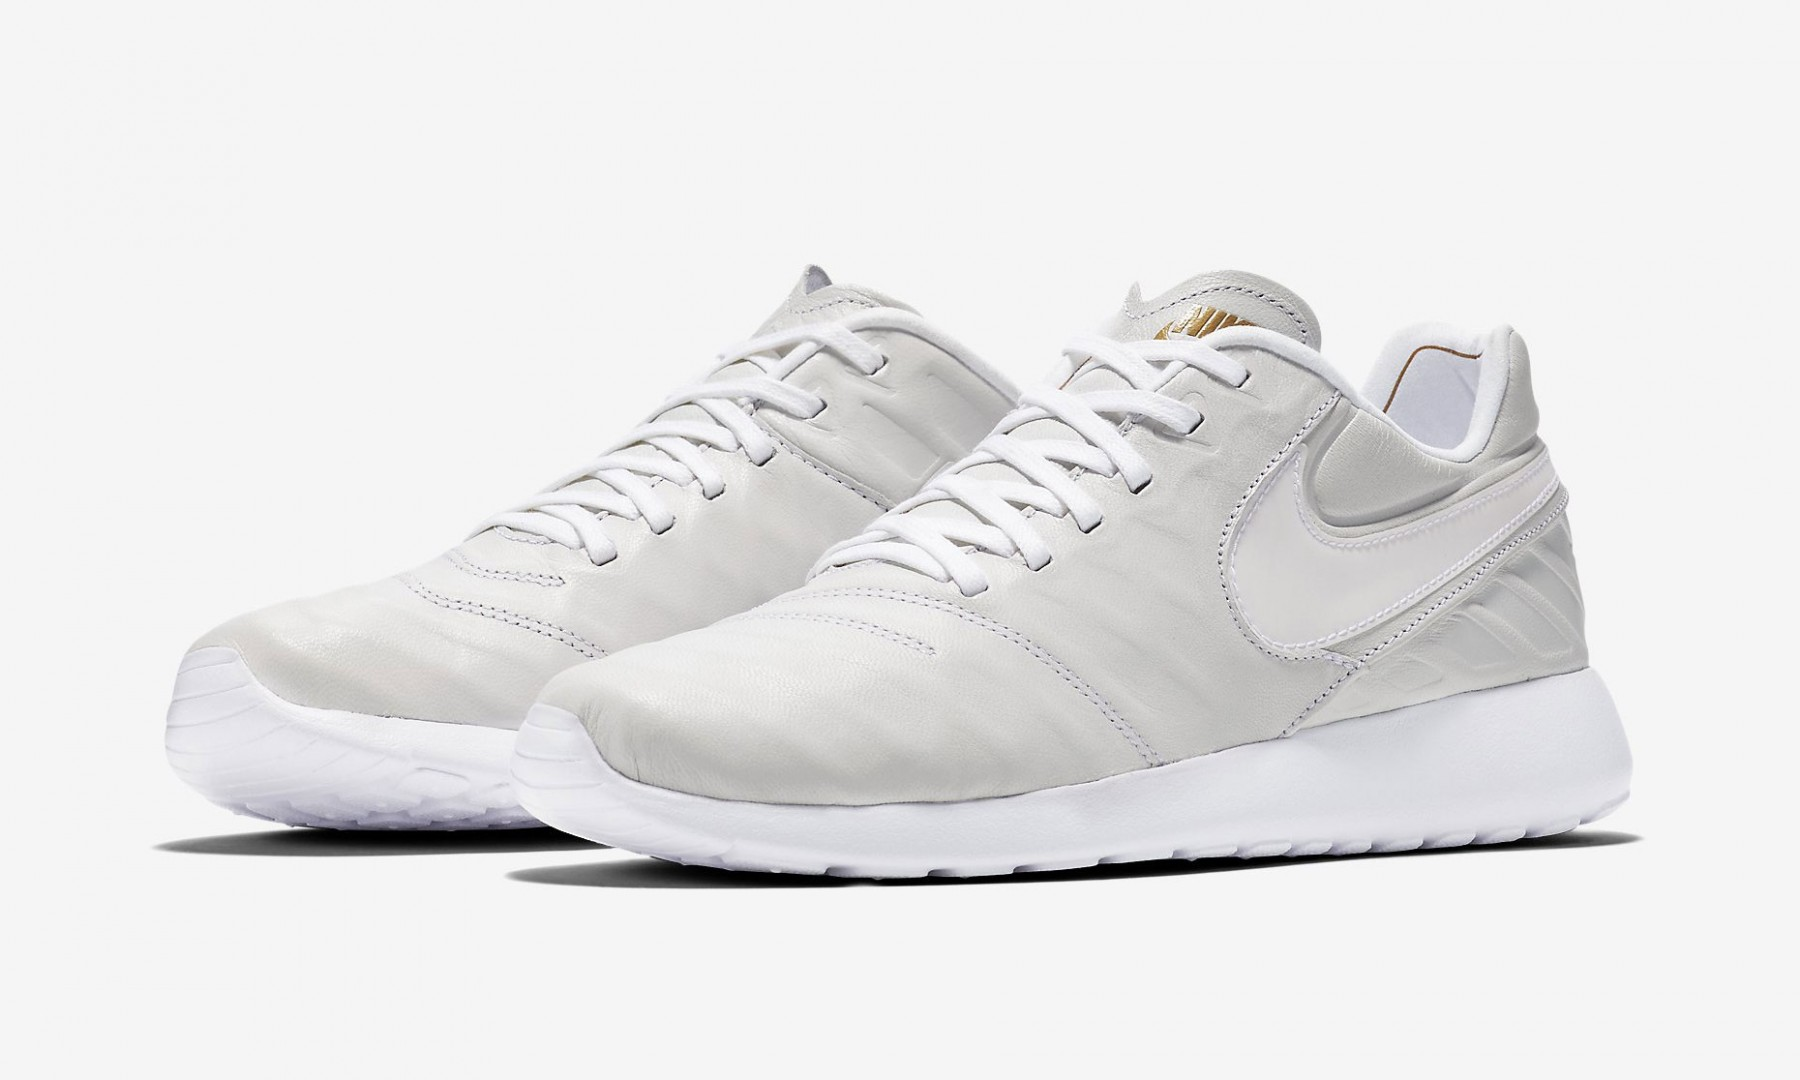 newest 731c9 7844f ... nike-roshe-tiempo-qs-7-1800x1080 Homme Nike Roshe Tiempo VI ...